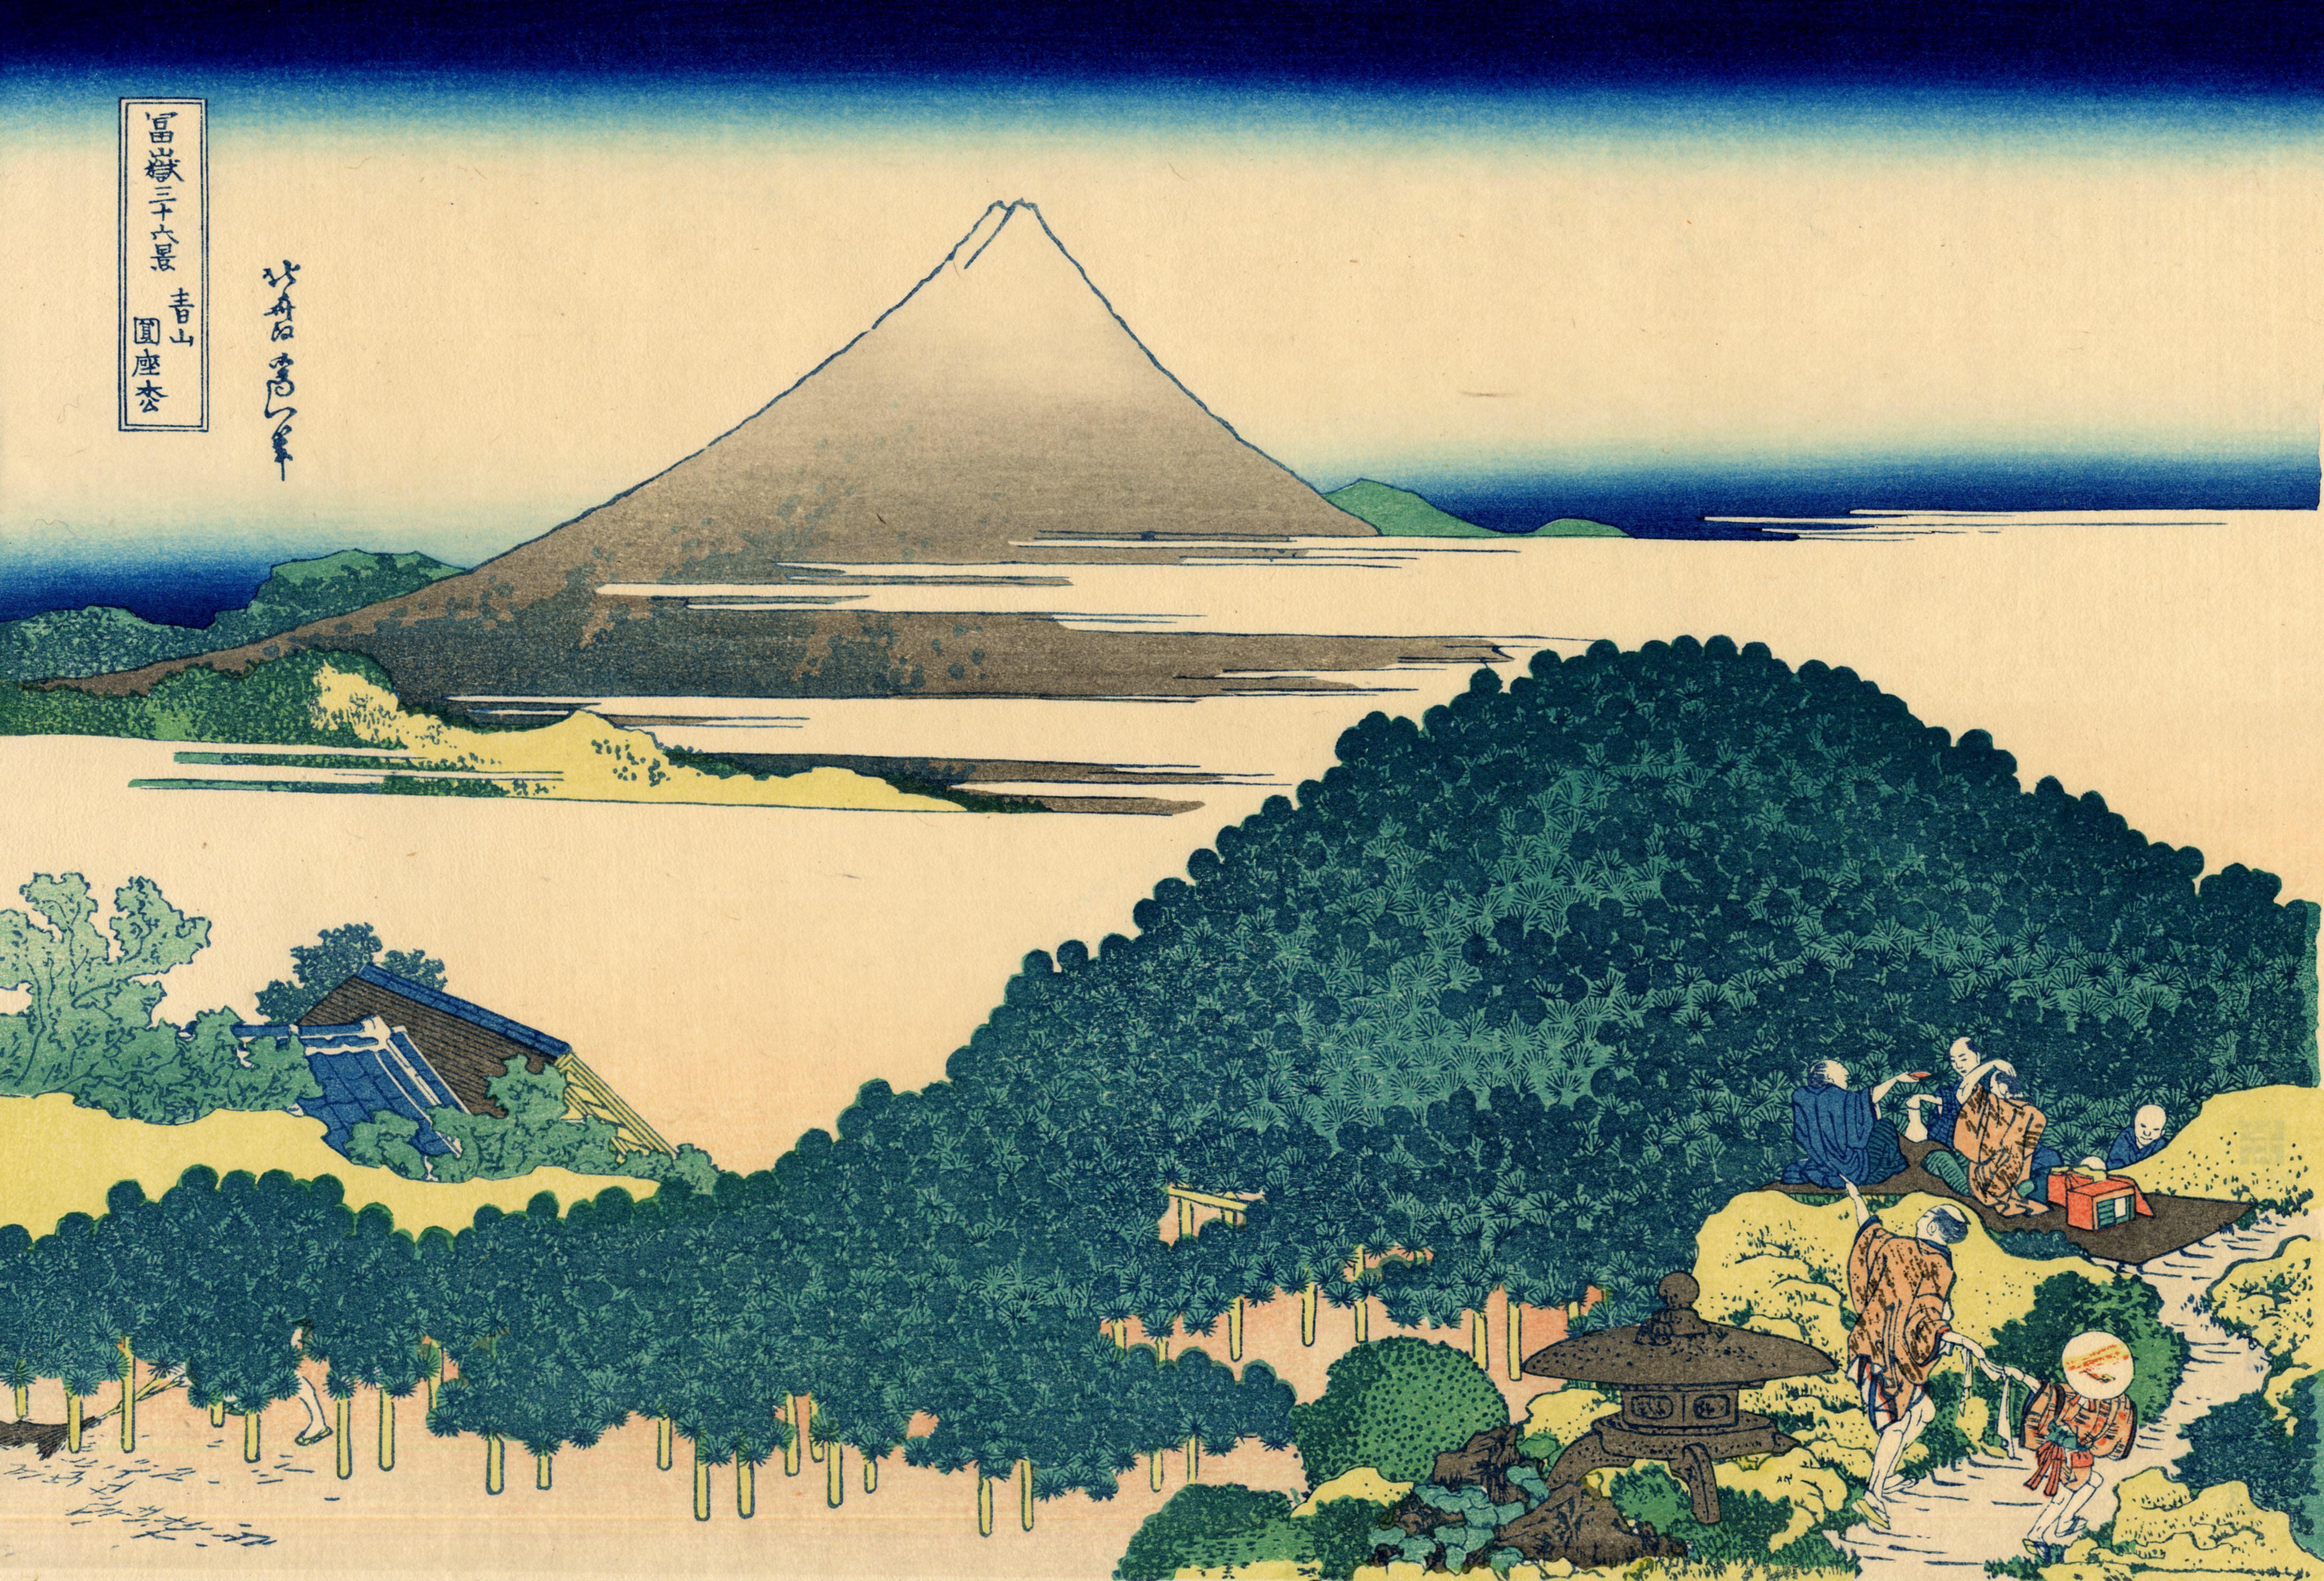 Hokusai Katsushika Wallpaper 06 The coast of seven leages in Kamakura 4340x2952